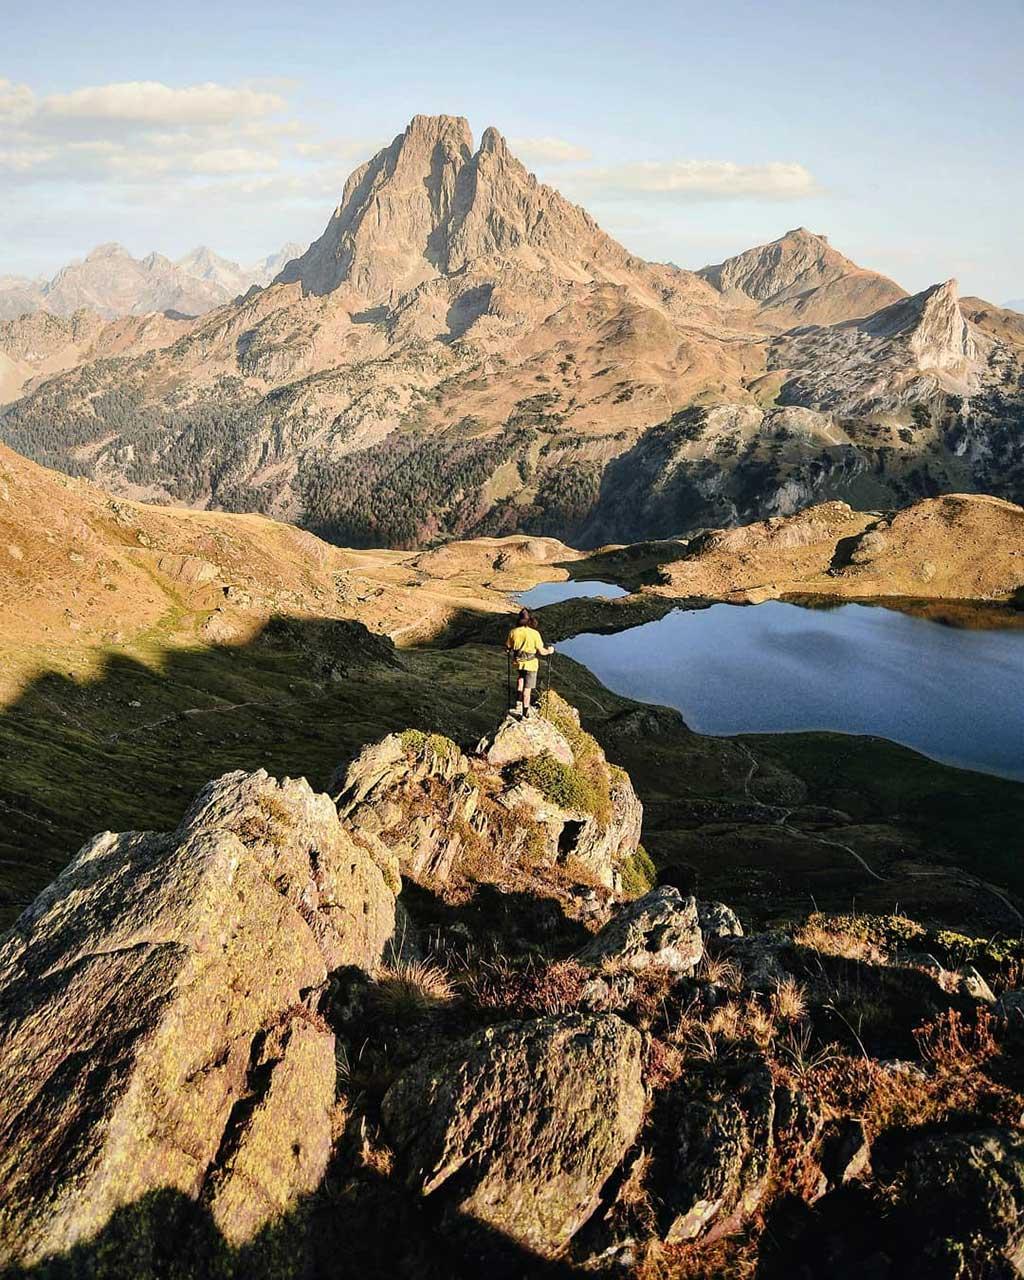 Fotografía montaña Pirineos by @julentto